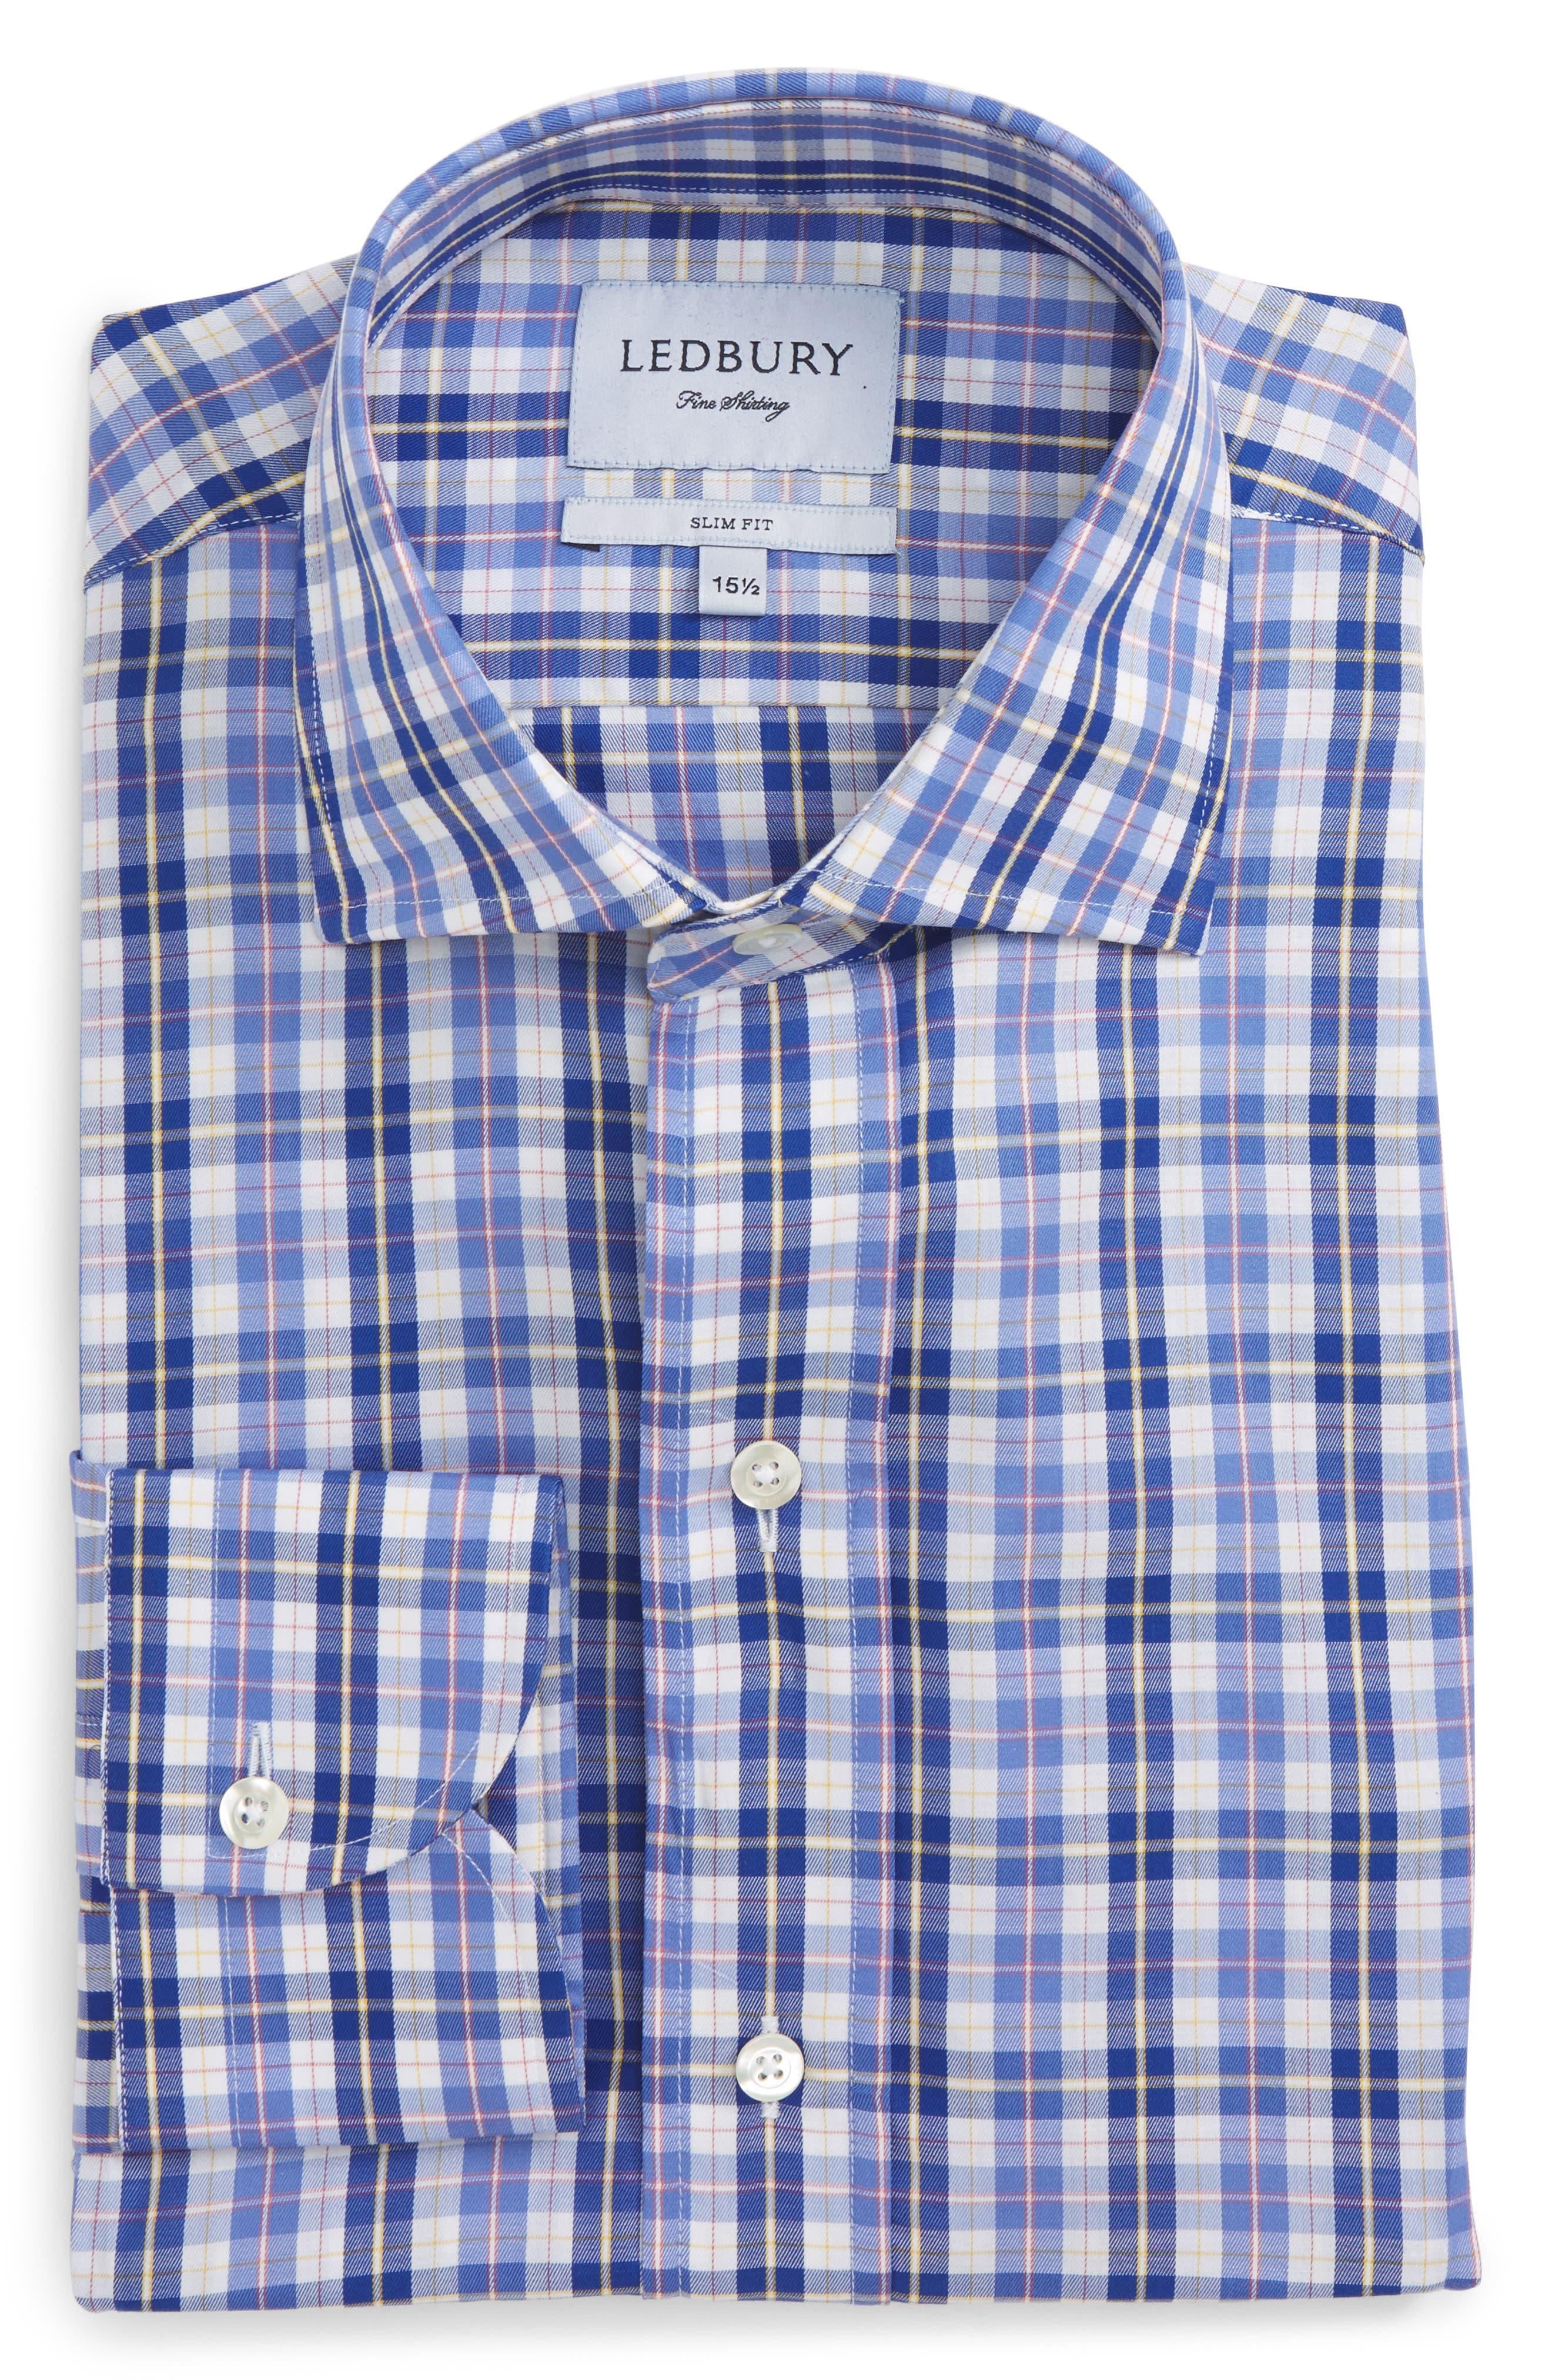 Alternate Image 1 Selected - Ledbury Slim Fit Check Dress Shirt